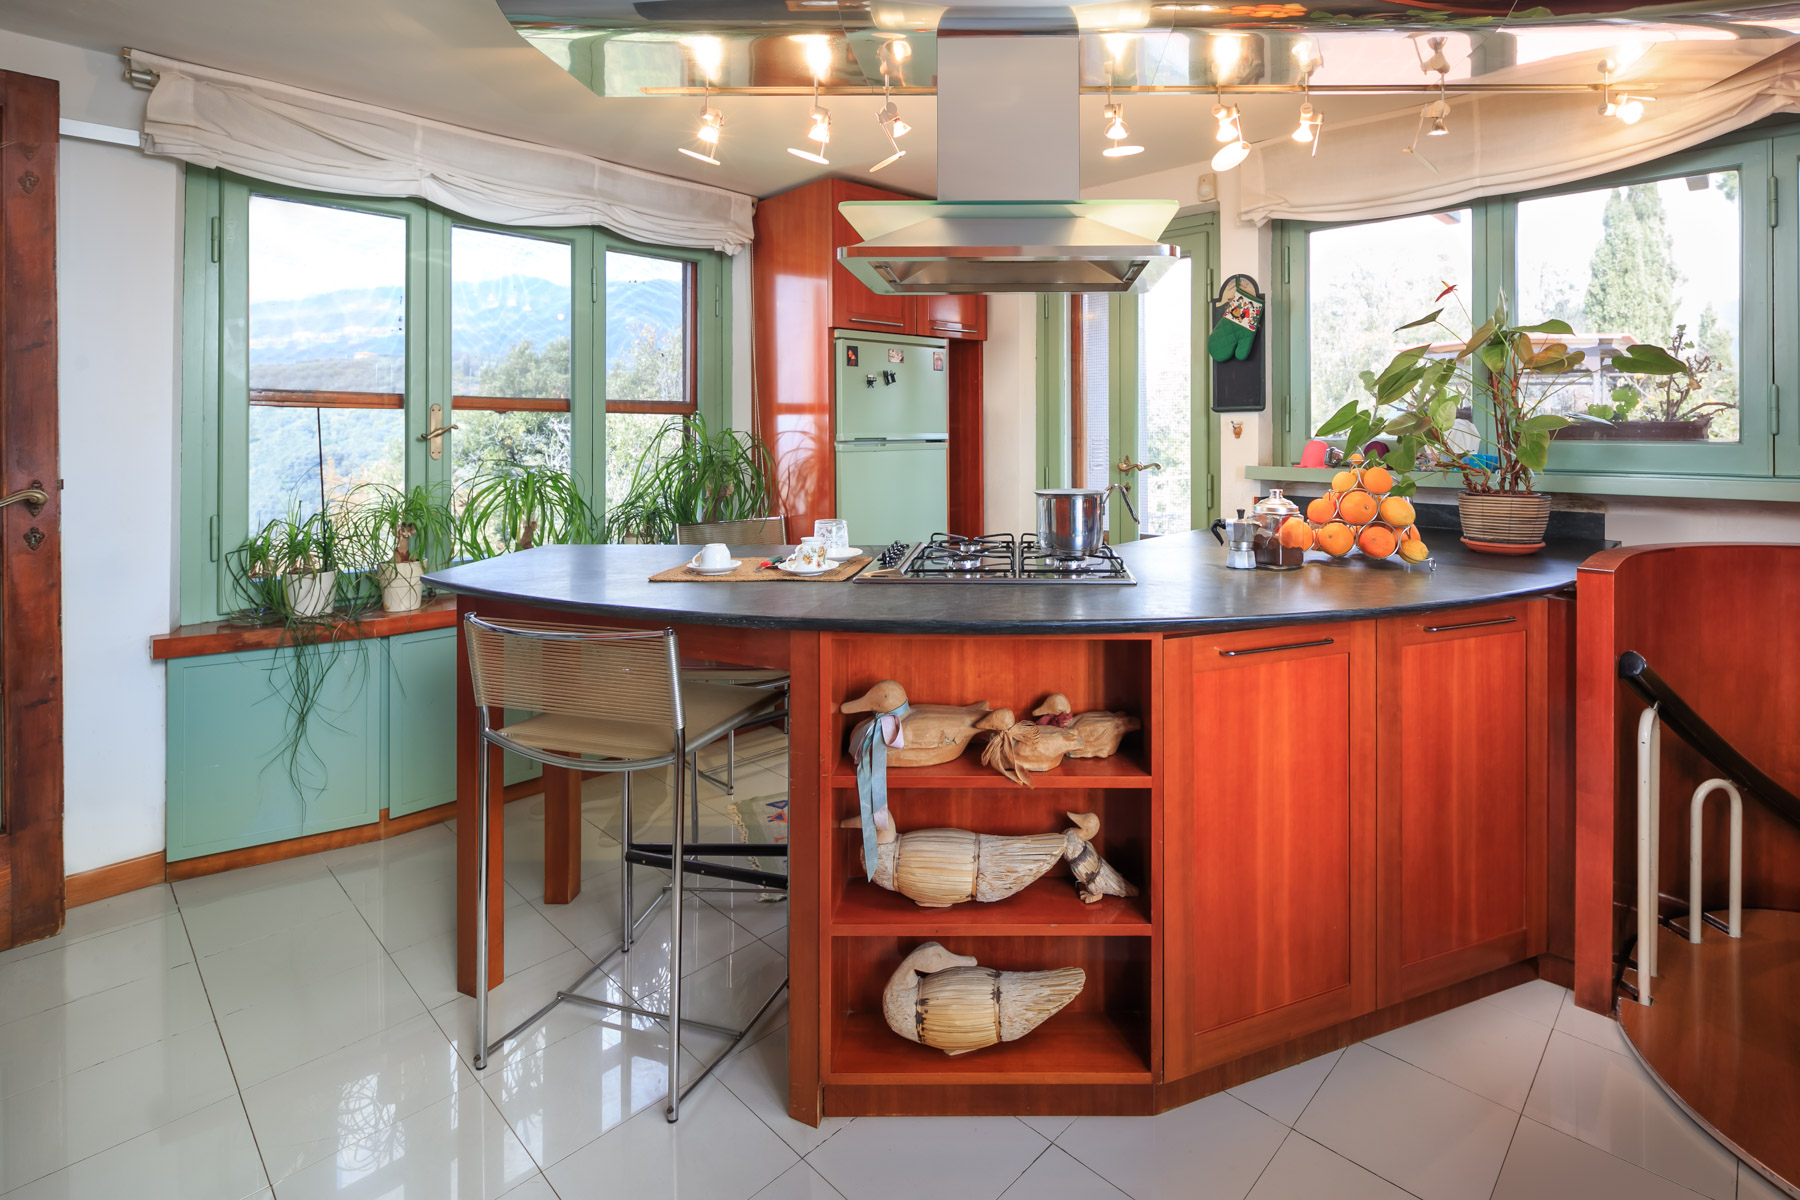 Villa in Vendita a Camaiore: 5 locali, 500 mq - Foto 15